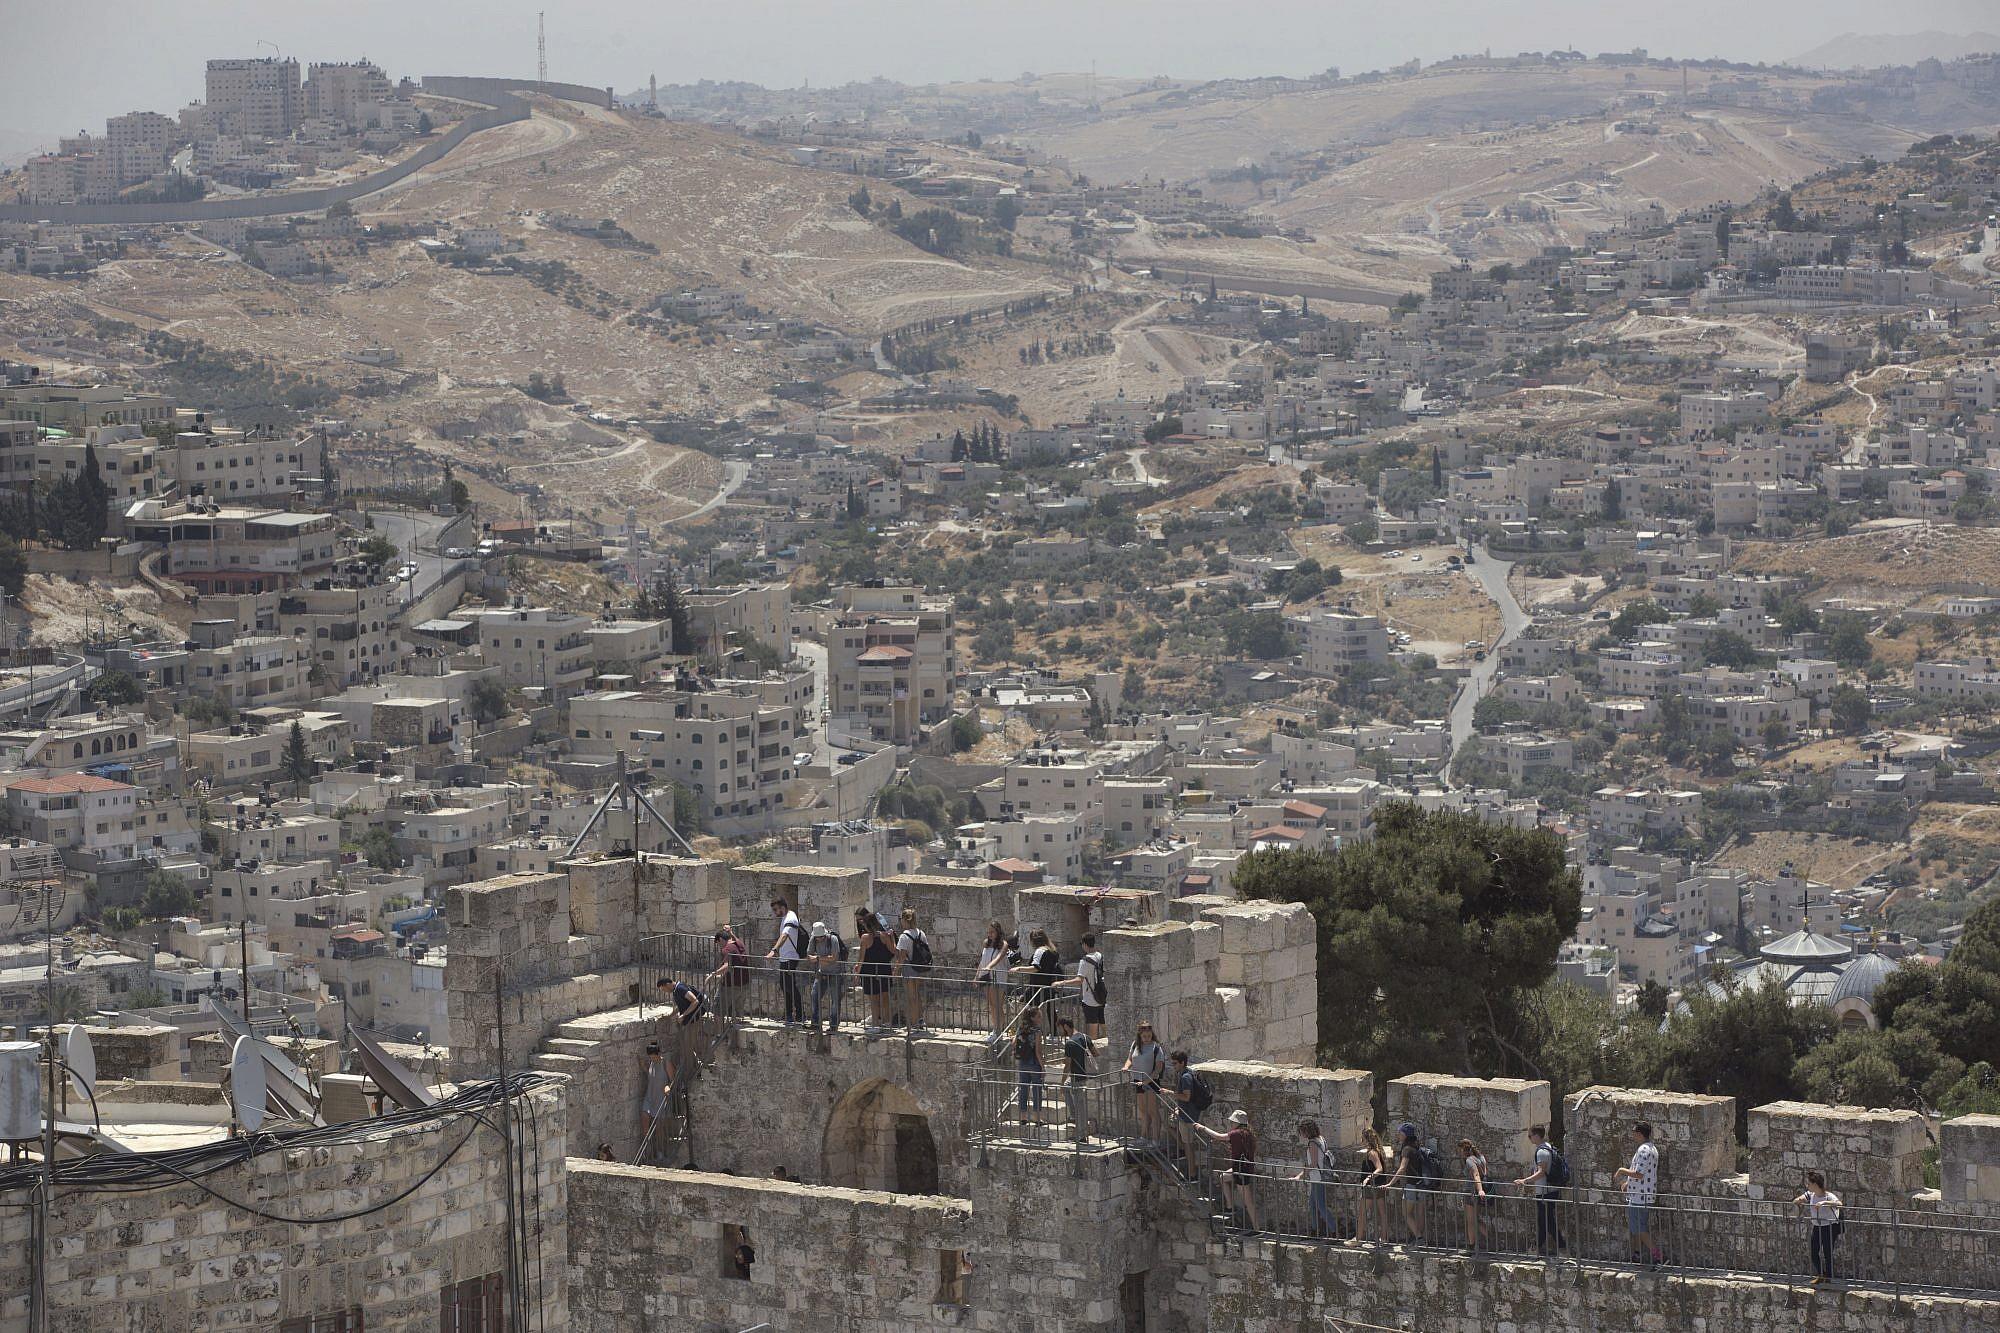 Old City walls offer glimpse of Jerusalem's richness | The ...